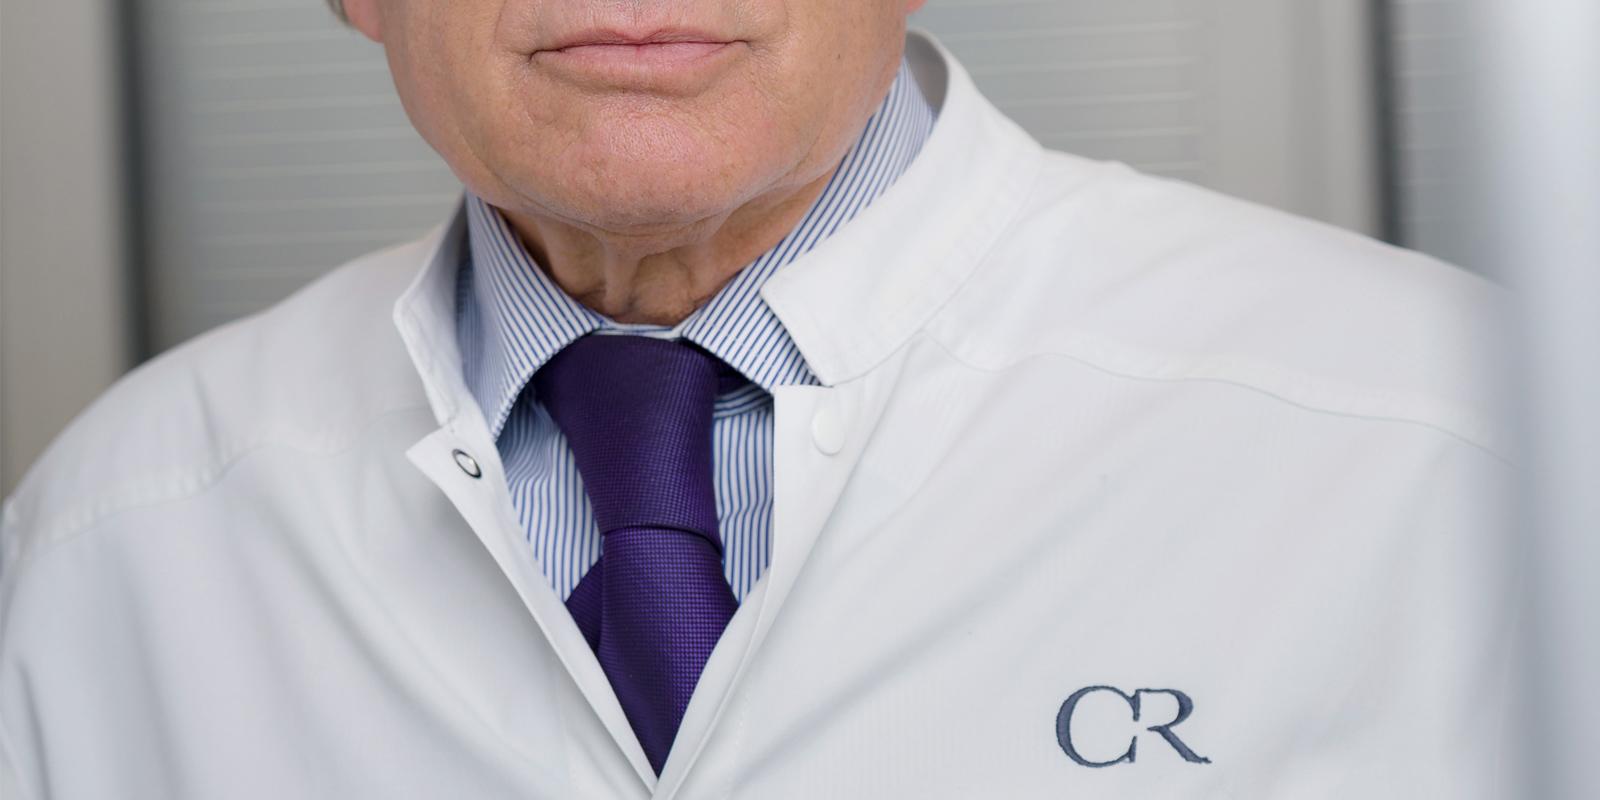 Dr Christian Richelme